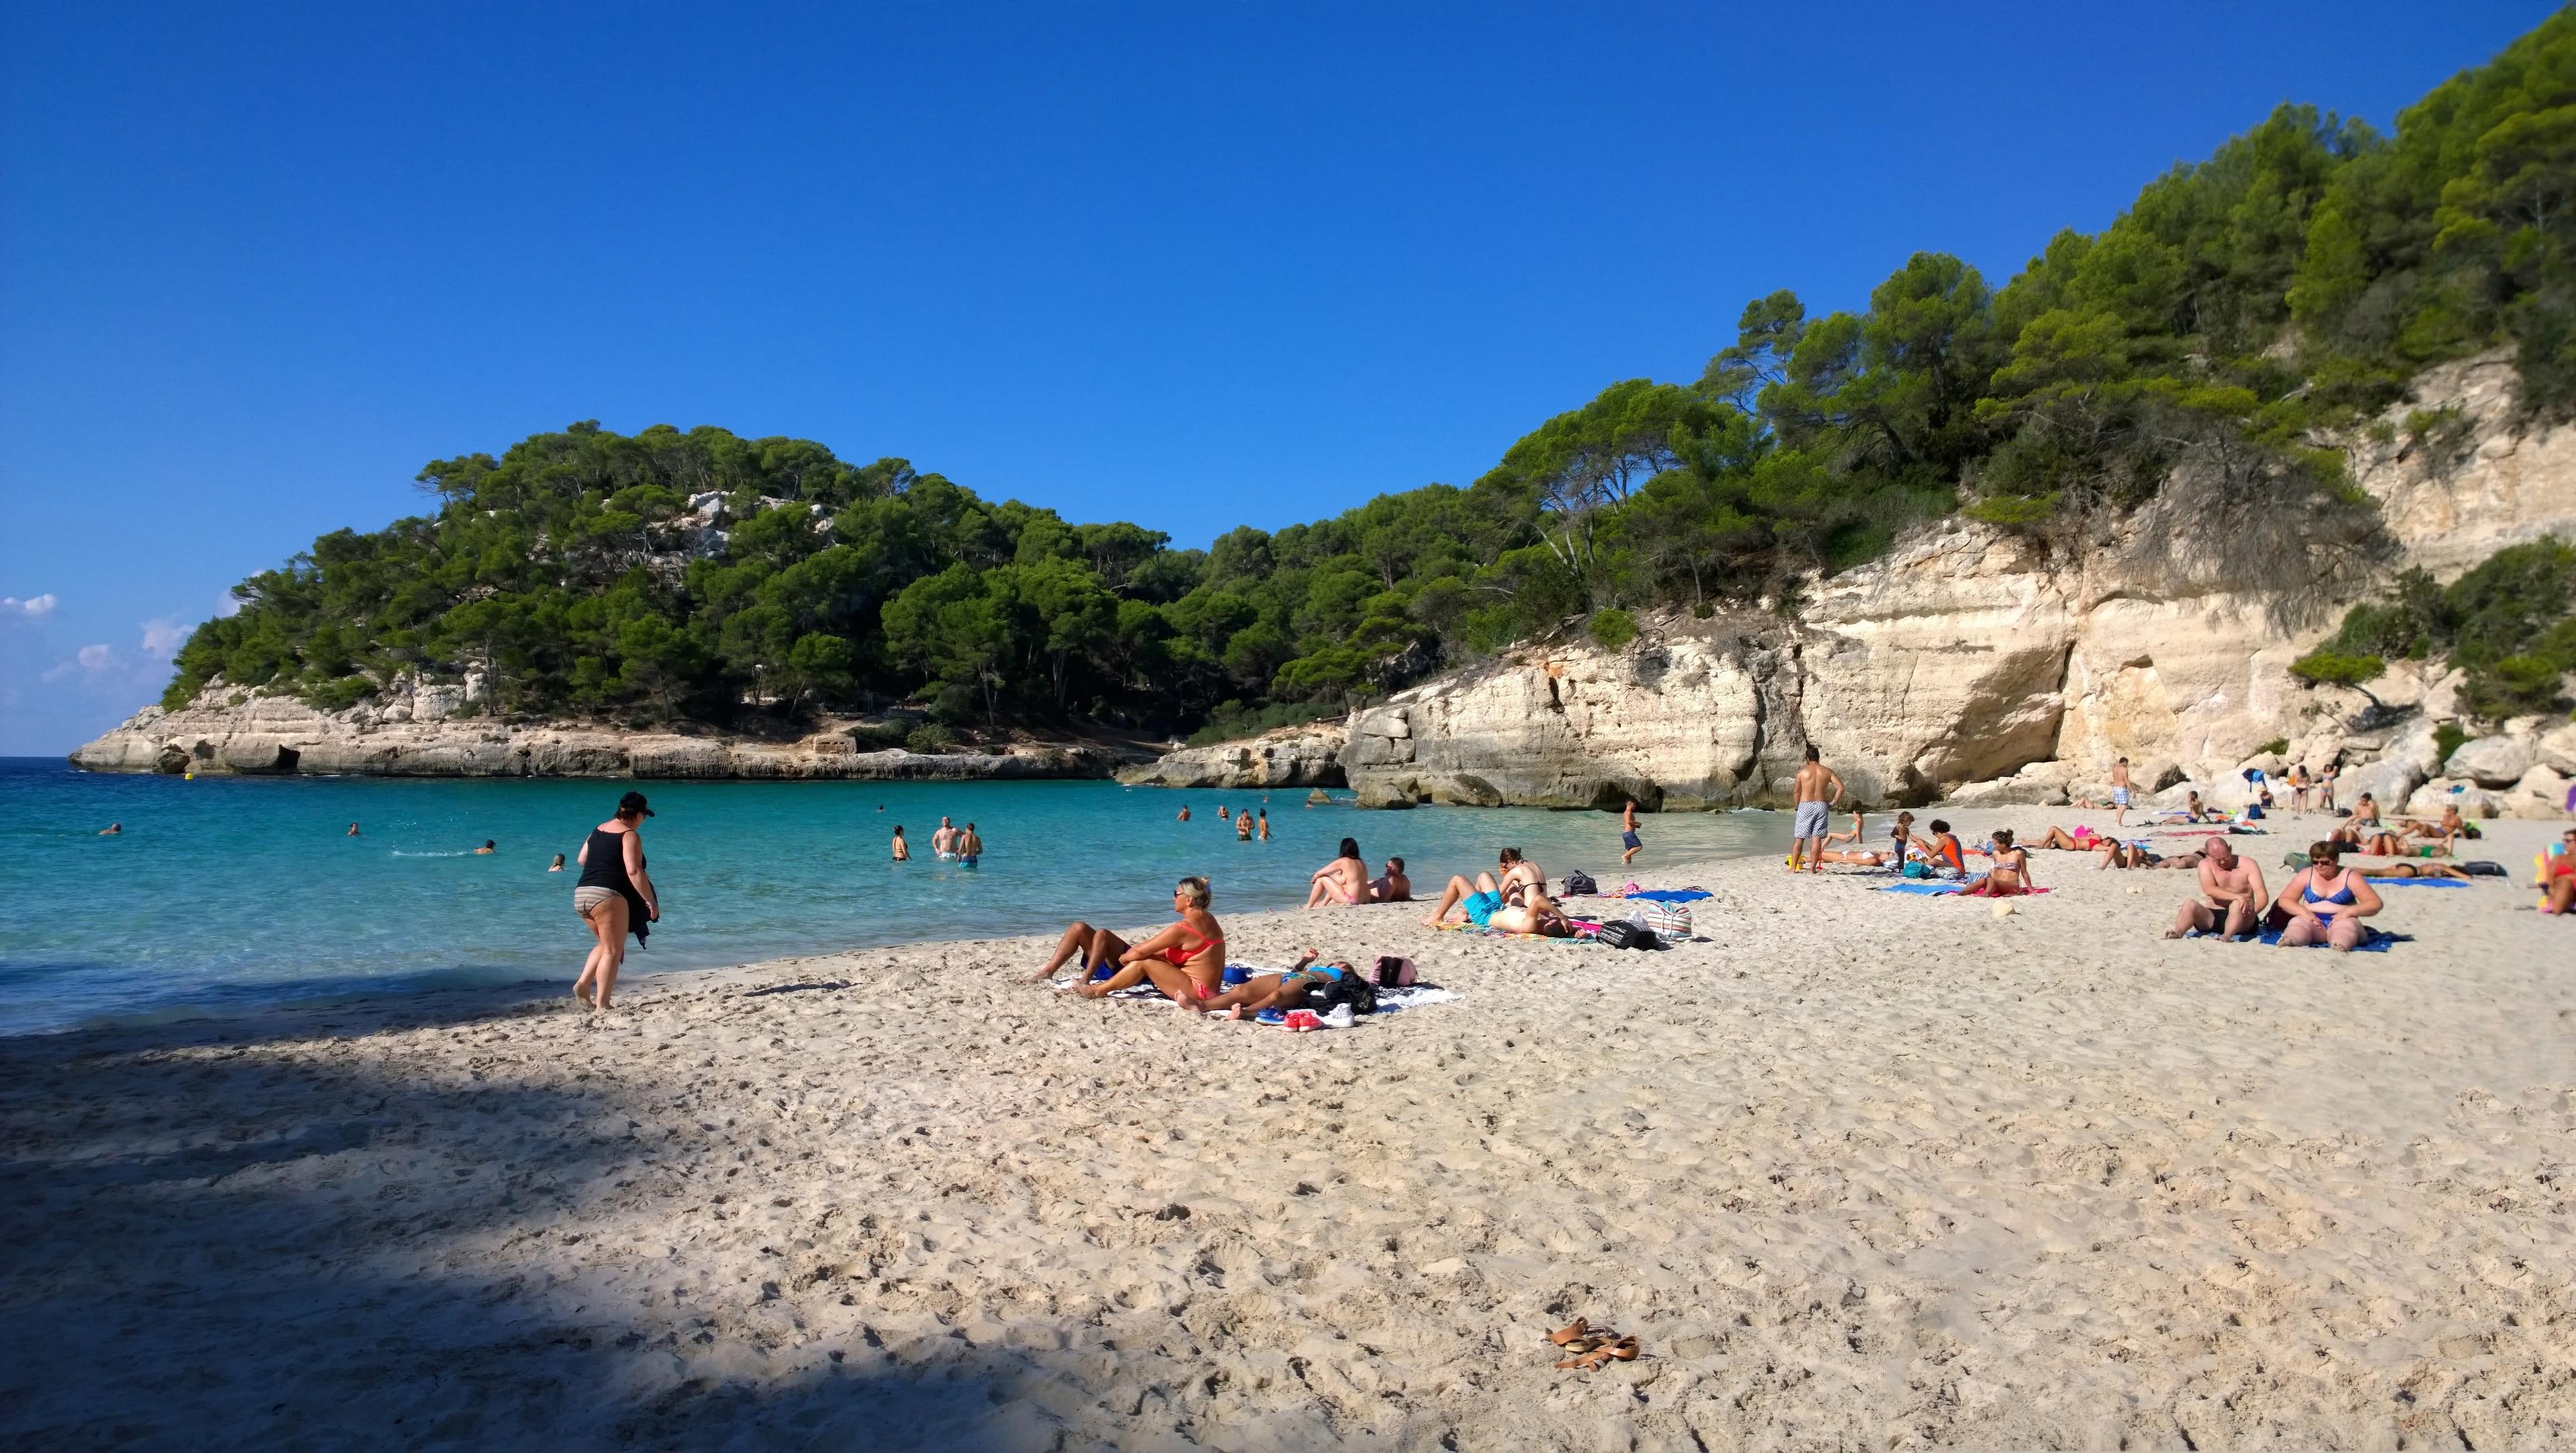 Cala Mitjana Beach, Ferreries, Balearic Islands, Spain